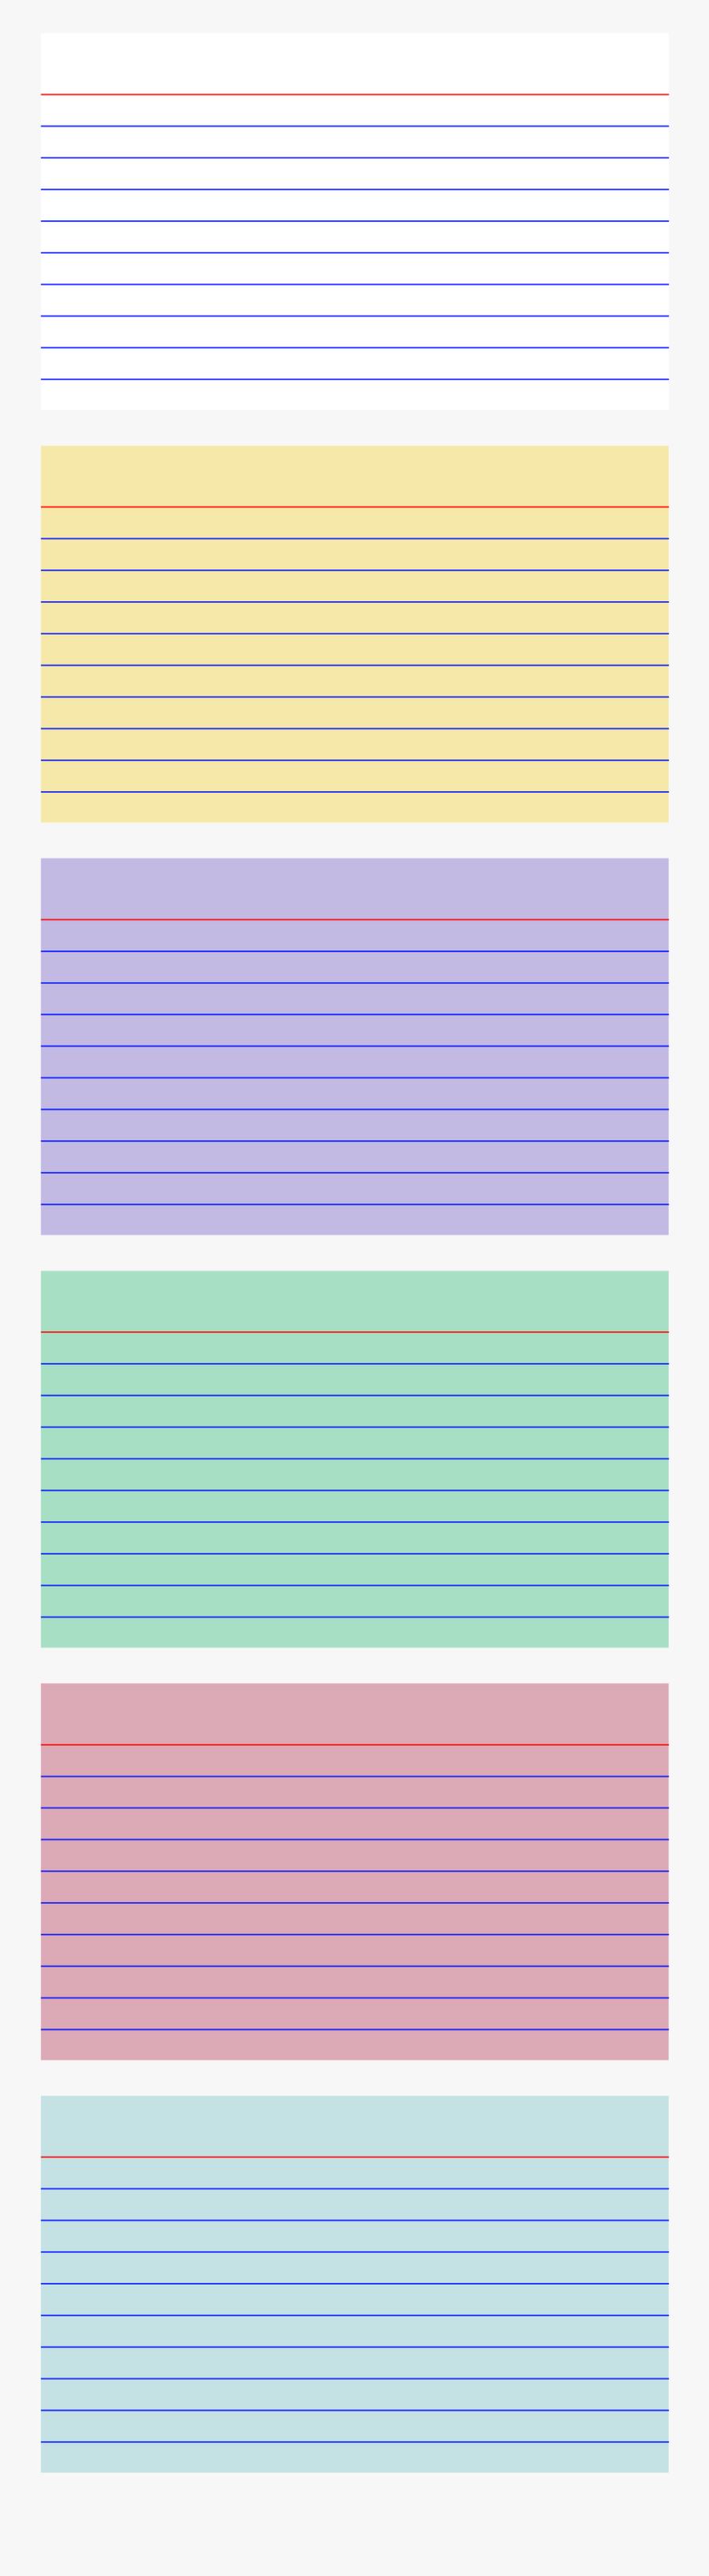 Index Card Png, Transparent Clipart